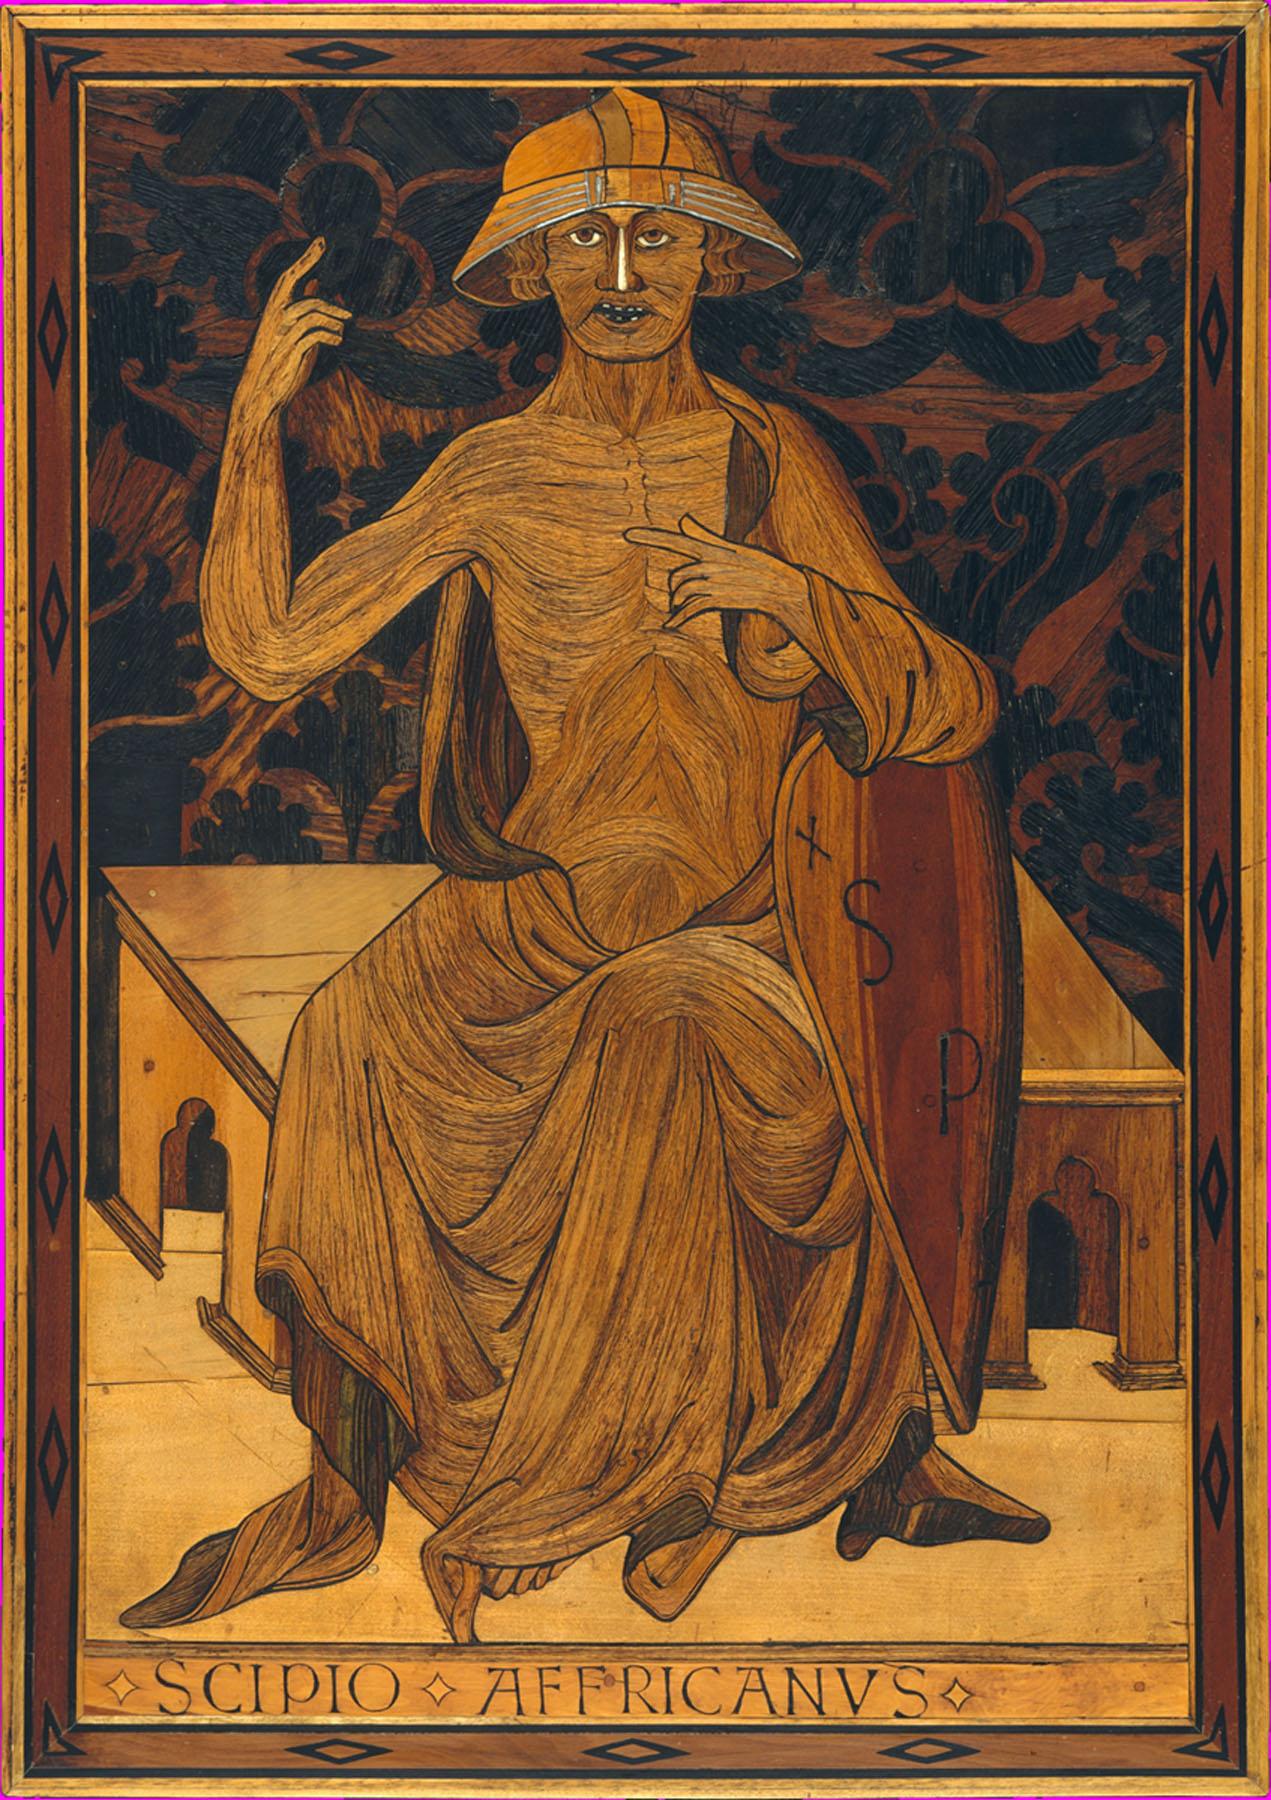 cipio Africanus (ca. 1425–30), intarsia by Mattia di Nanni di Stefano using poplar, bog oak and other wood inlay, rosewood, tin, bone, traces of green colouring — Source.